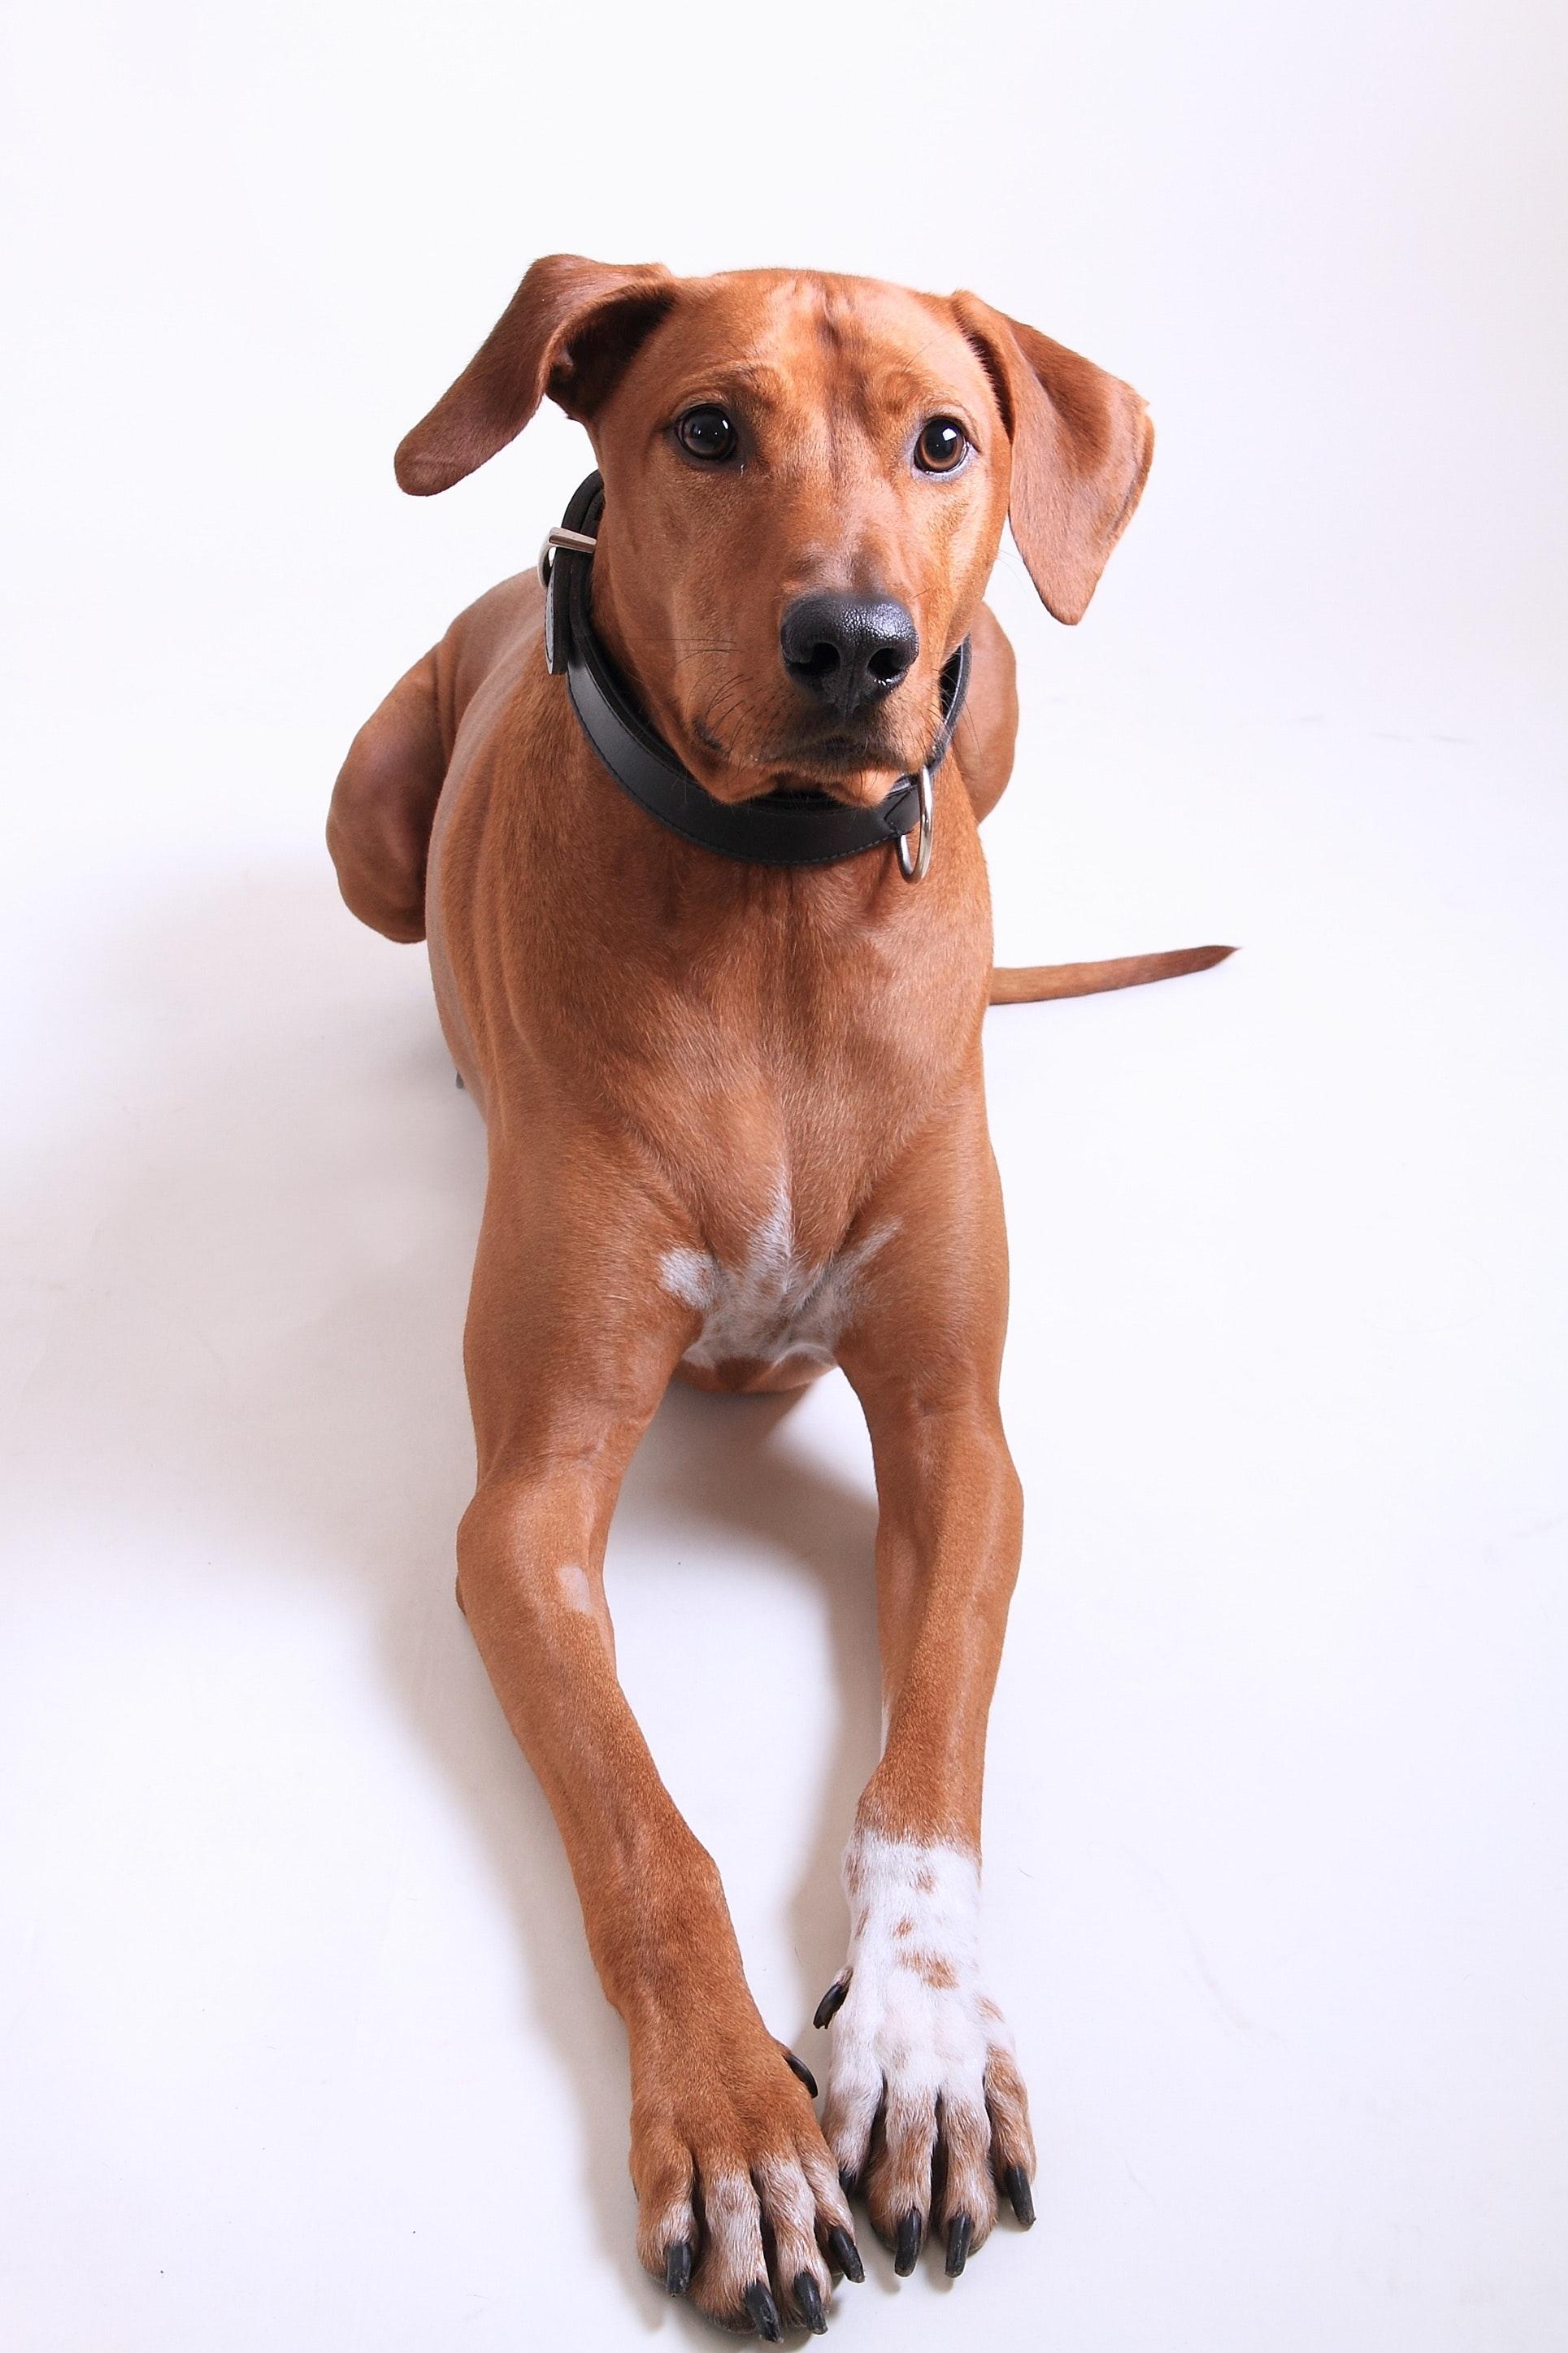 animal-breed-canine-460845.jpg